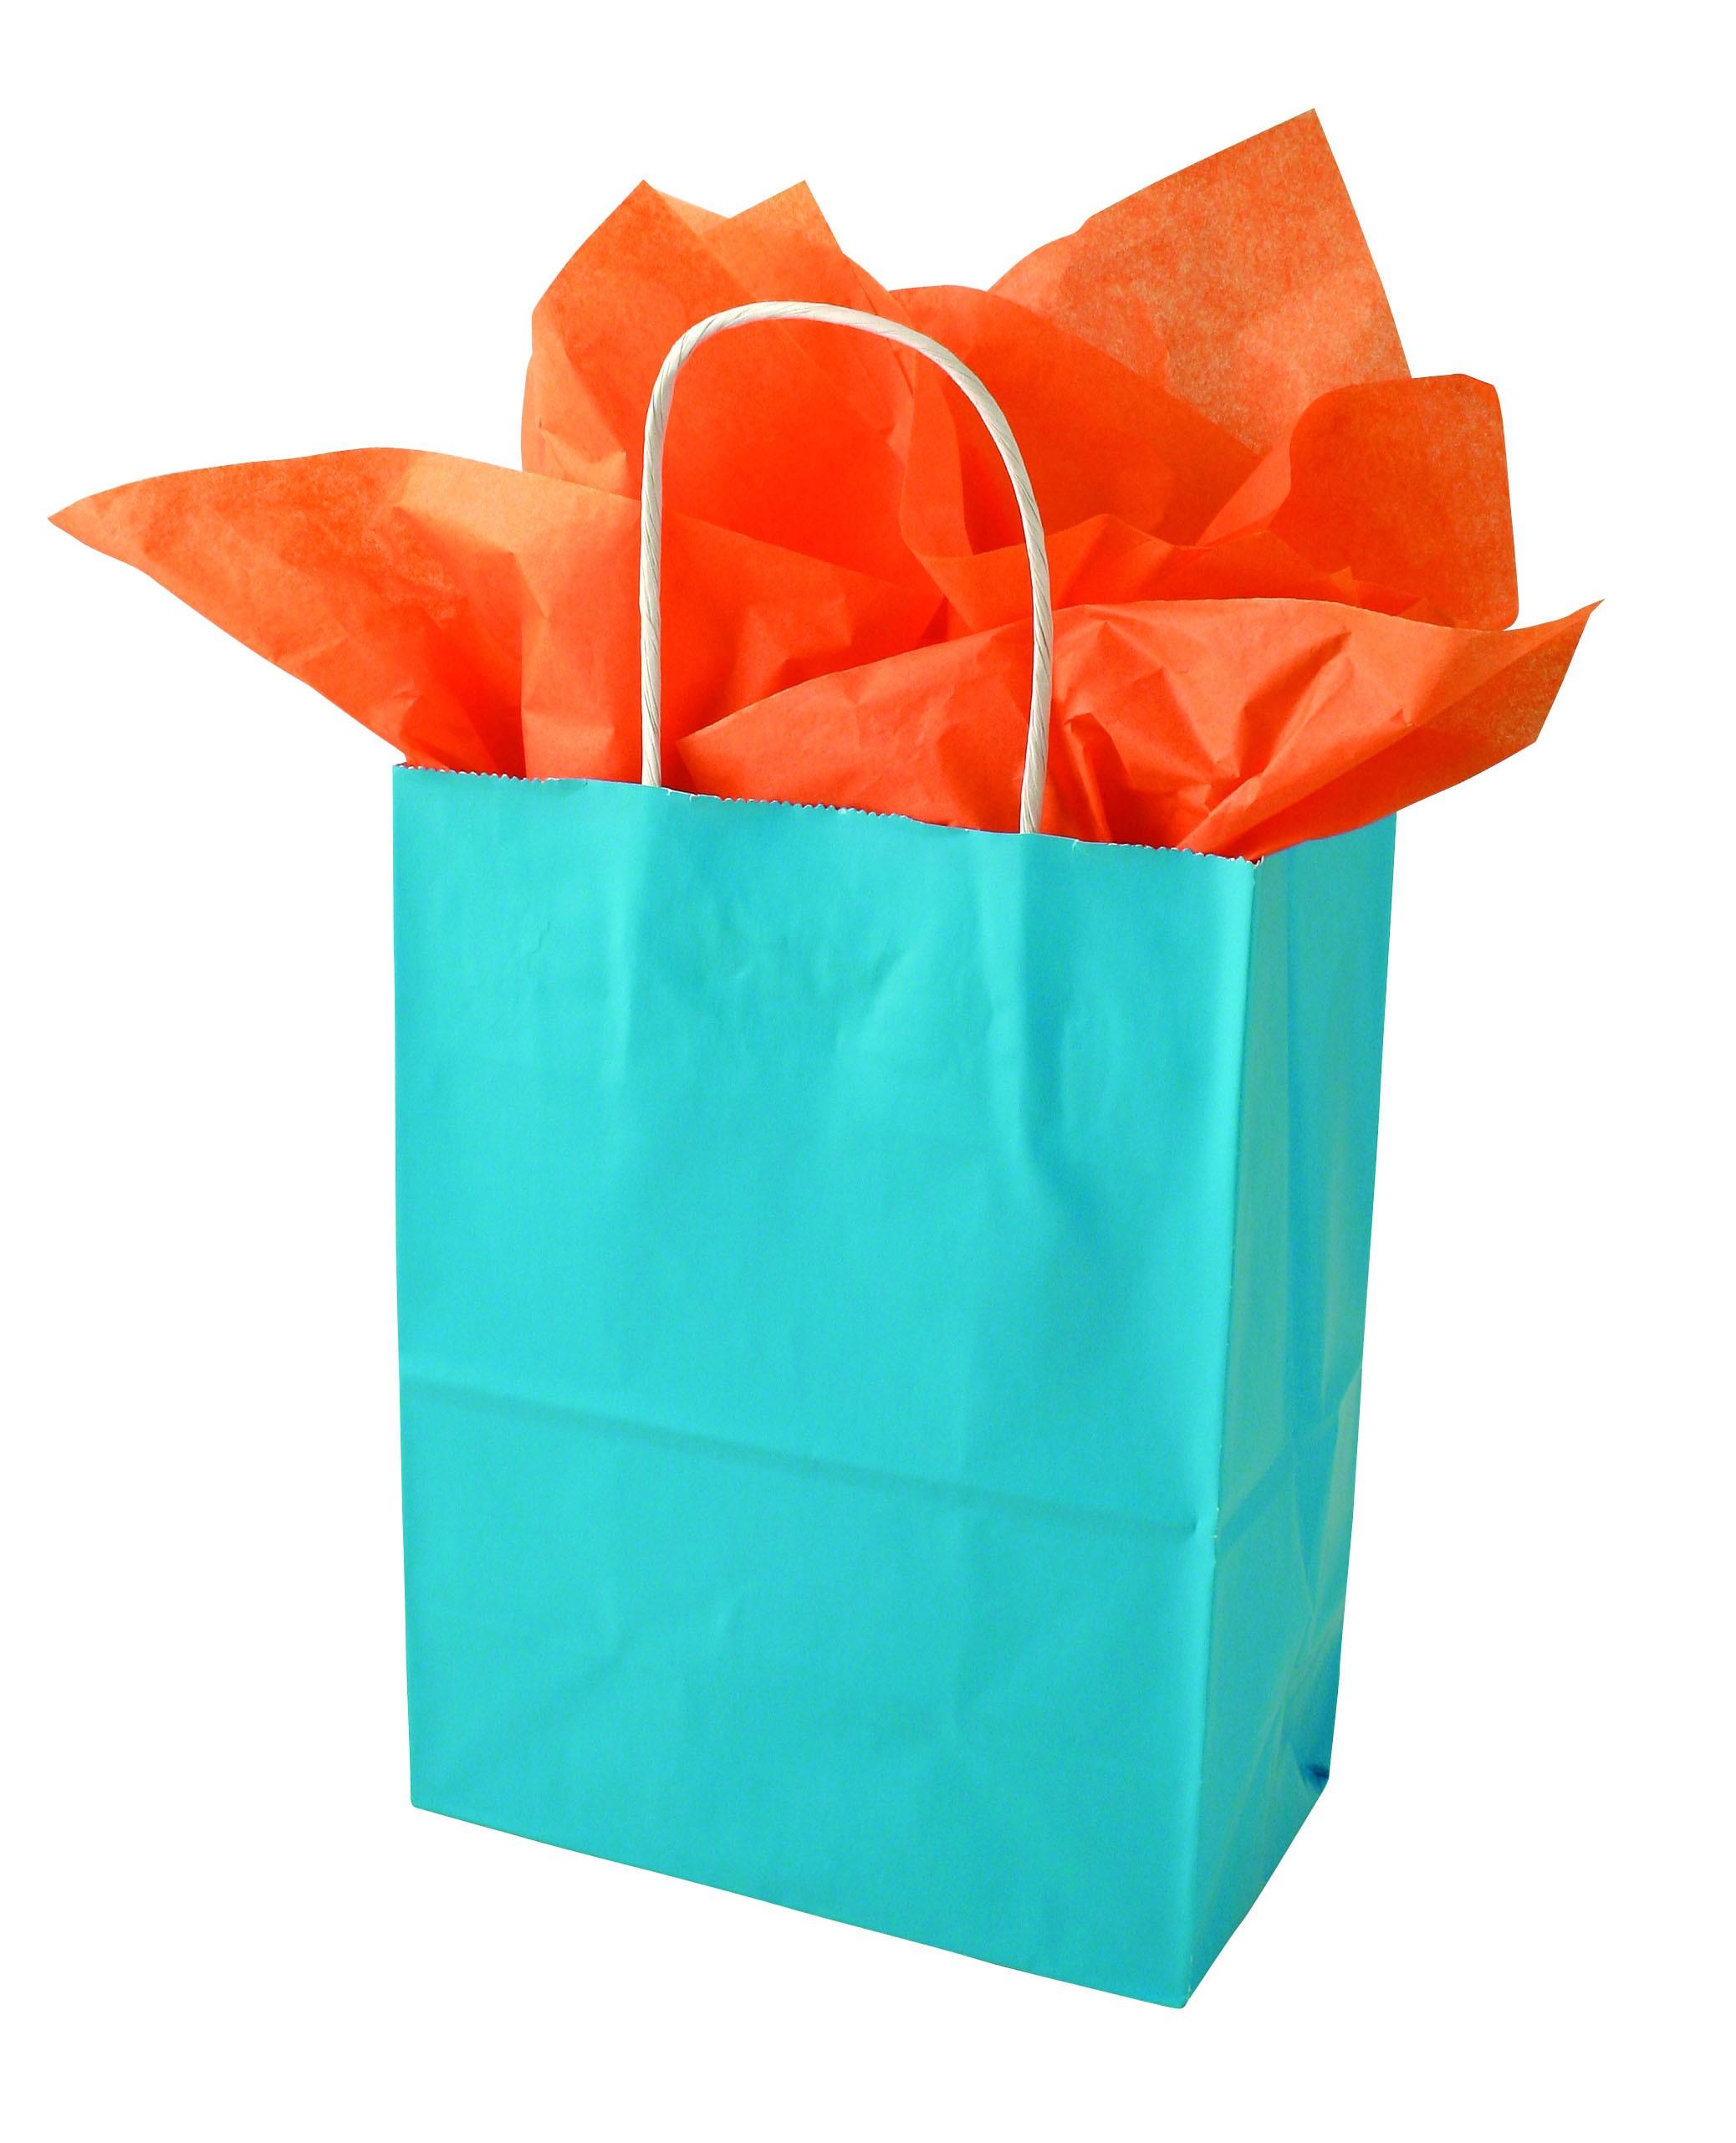 Free photo: Present bag - Sell, Sale, Retail - Free Download - Jooinn